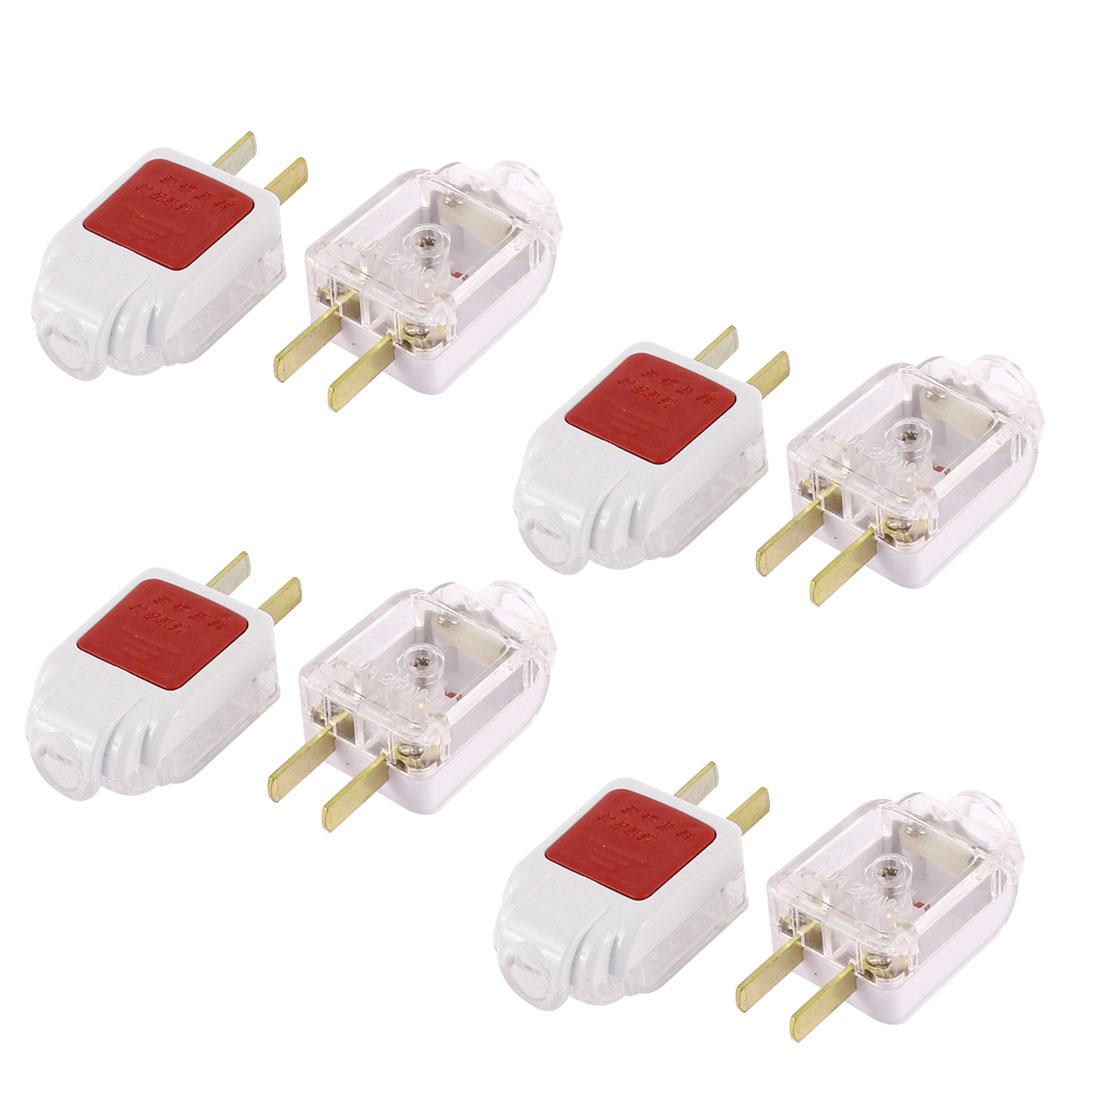 US Plug AC 250V 10A Rewirable Power Cord Connector Adapter 8Pcs